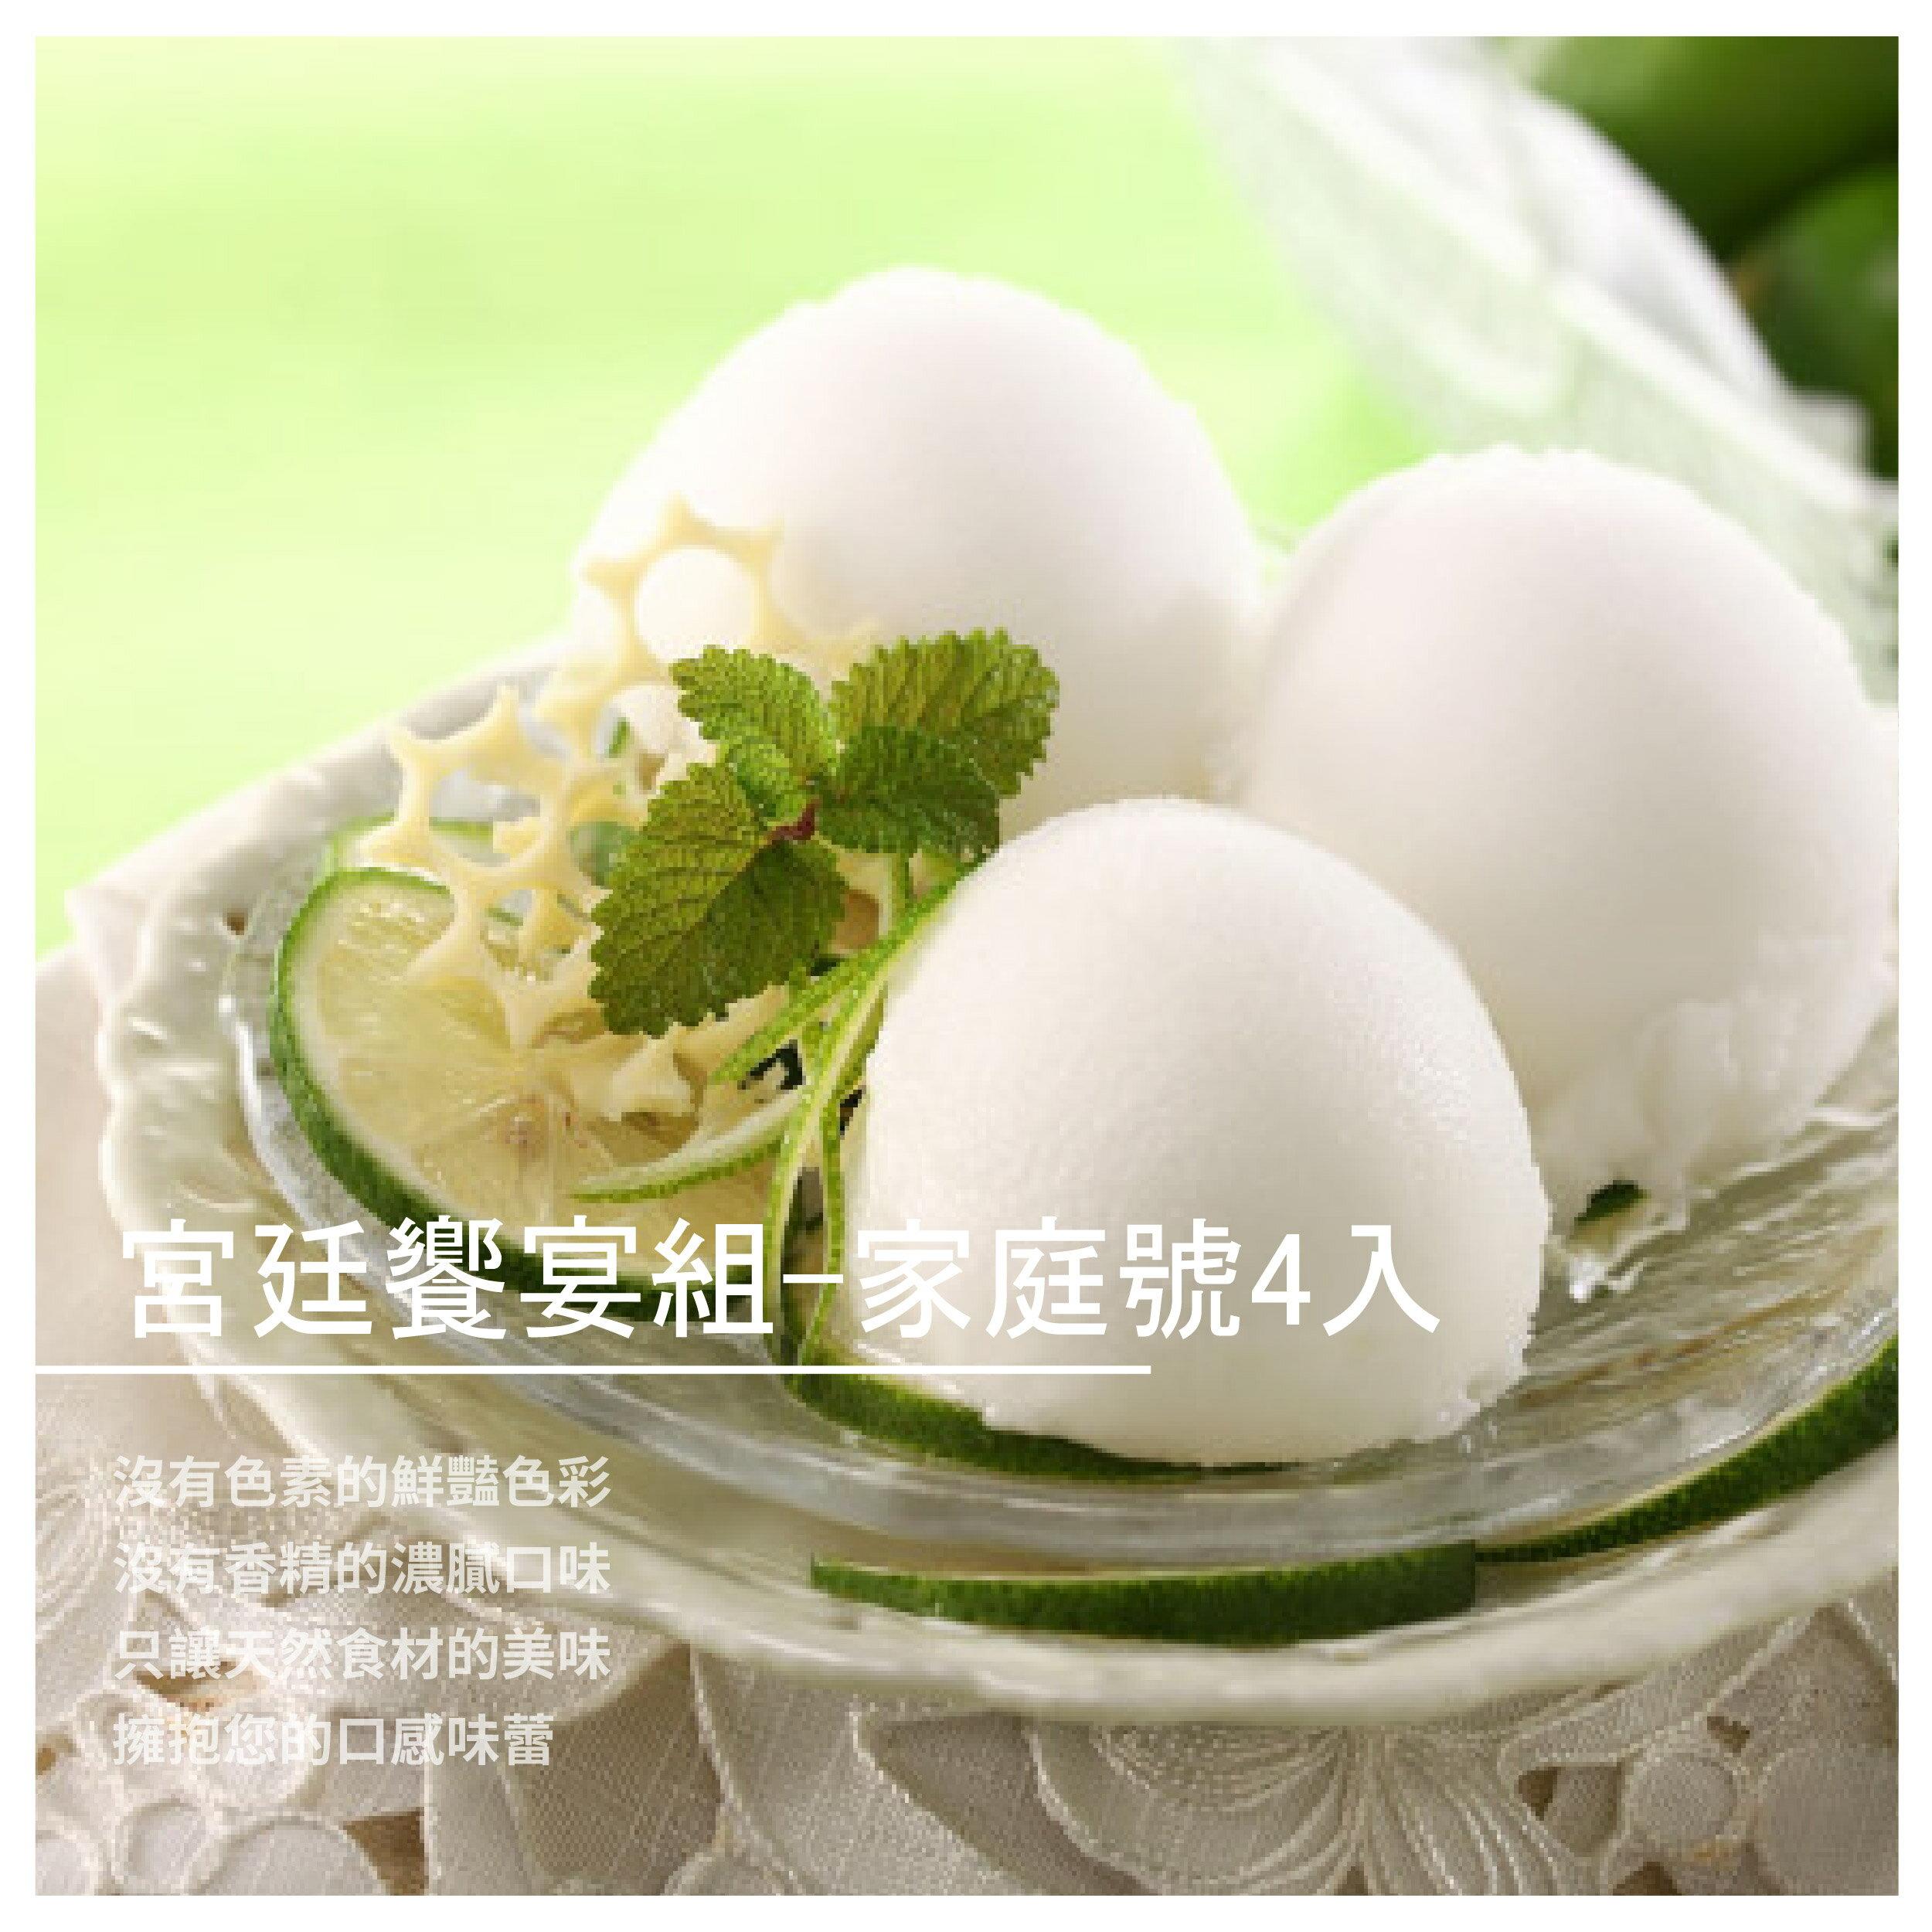 【Congel公爵法式手工冰淇淋】宮廷饗宴組-家庭號4入